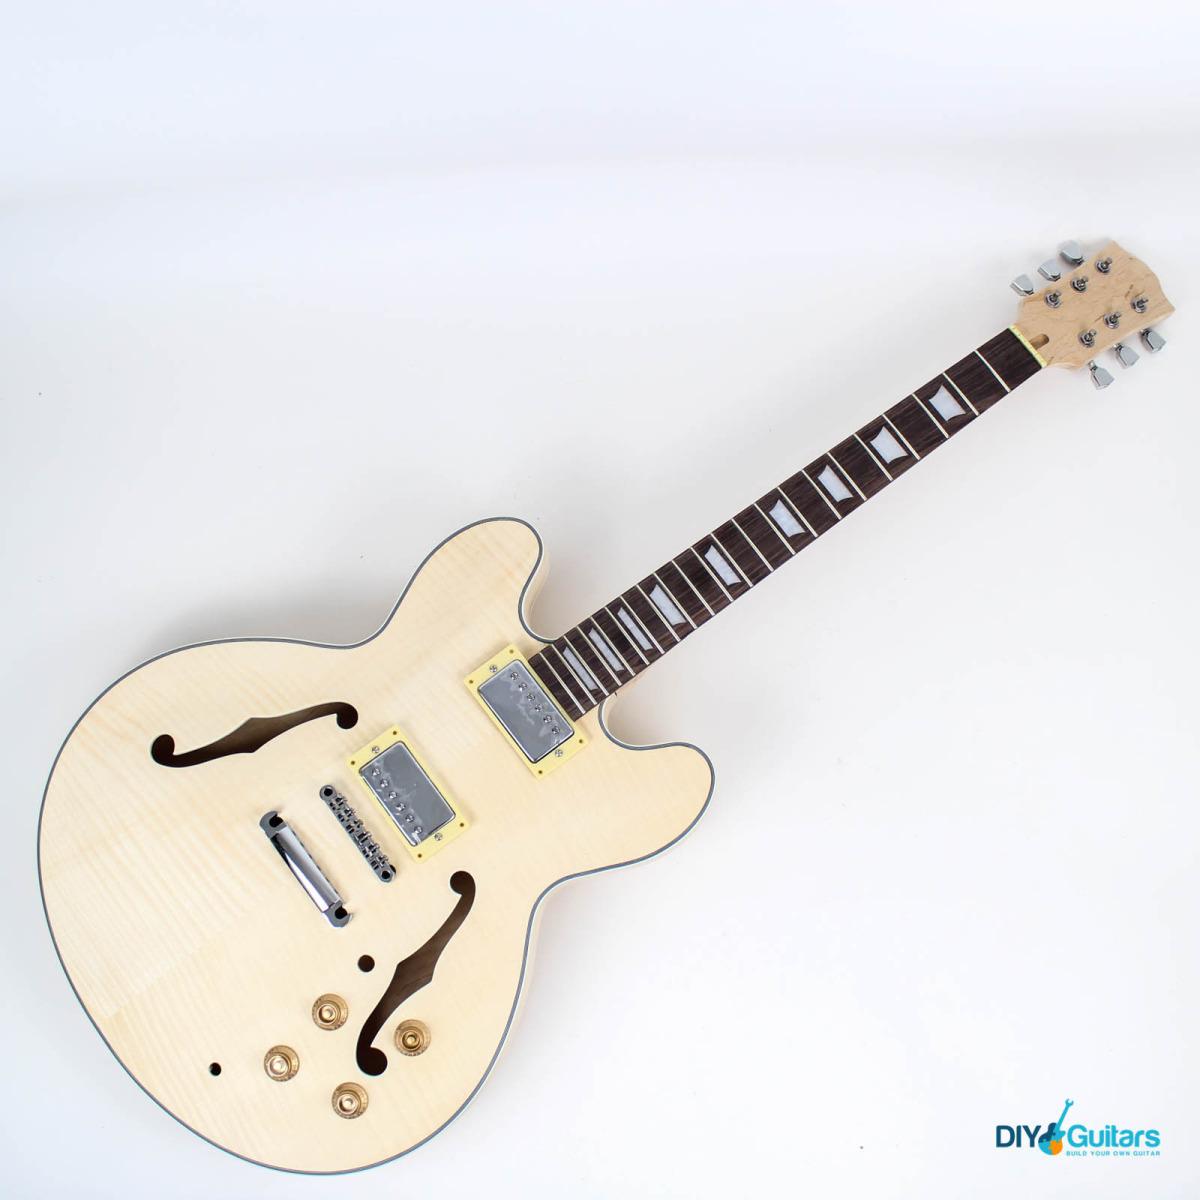 gibson es 335 style semi hollow diy guitars. Black Bedroom Furniture Sets. Home Design Ideas